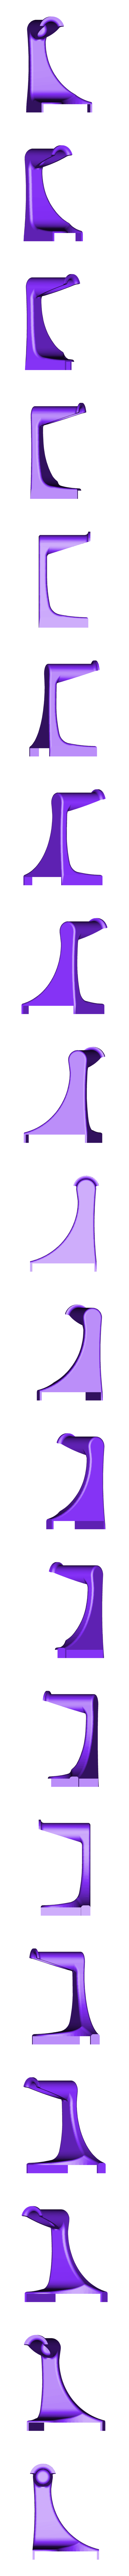 TEVO Tornado Filament Holder 2.STL Download free STL file TEVO Tornado Filament Holder 2 • 3D print design, 3D_Cre8or